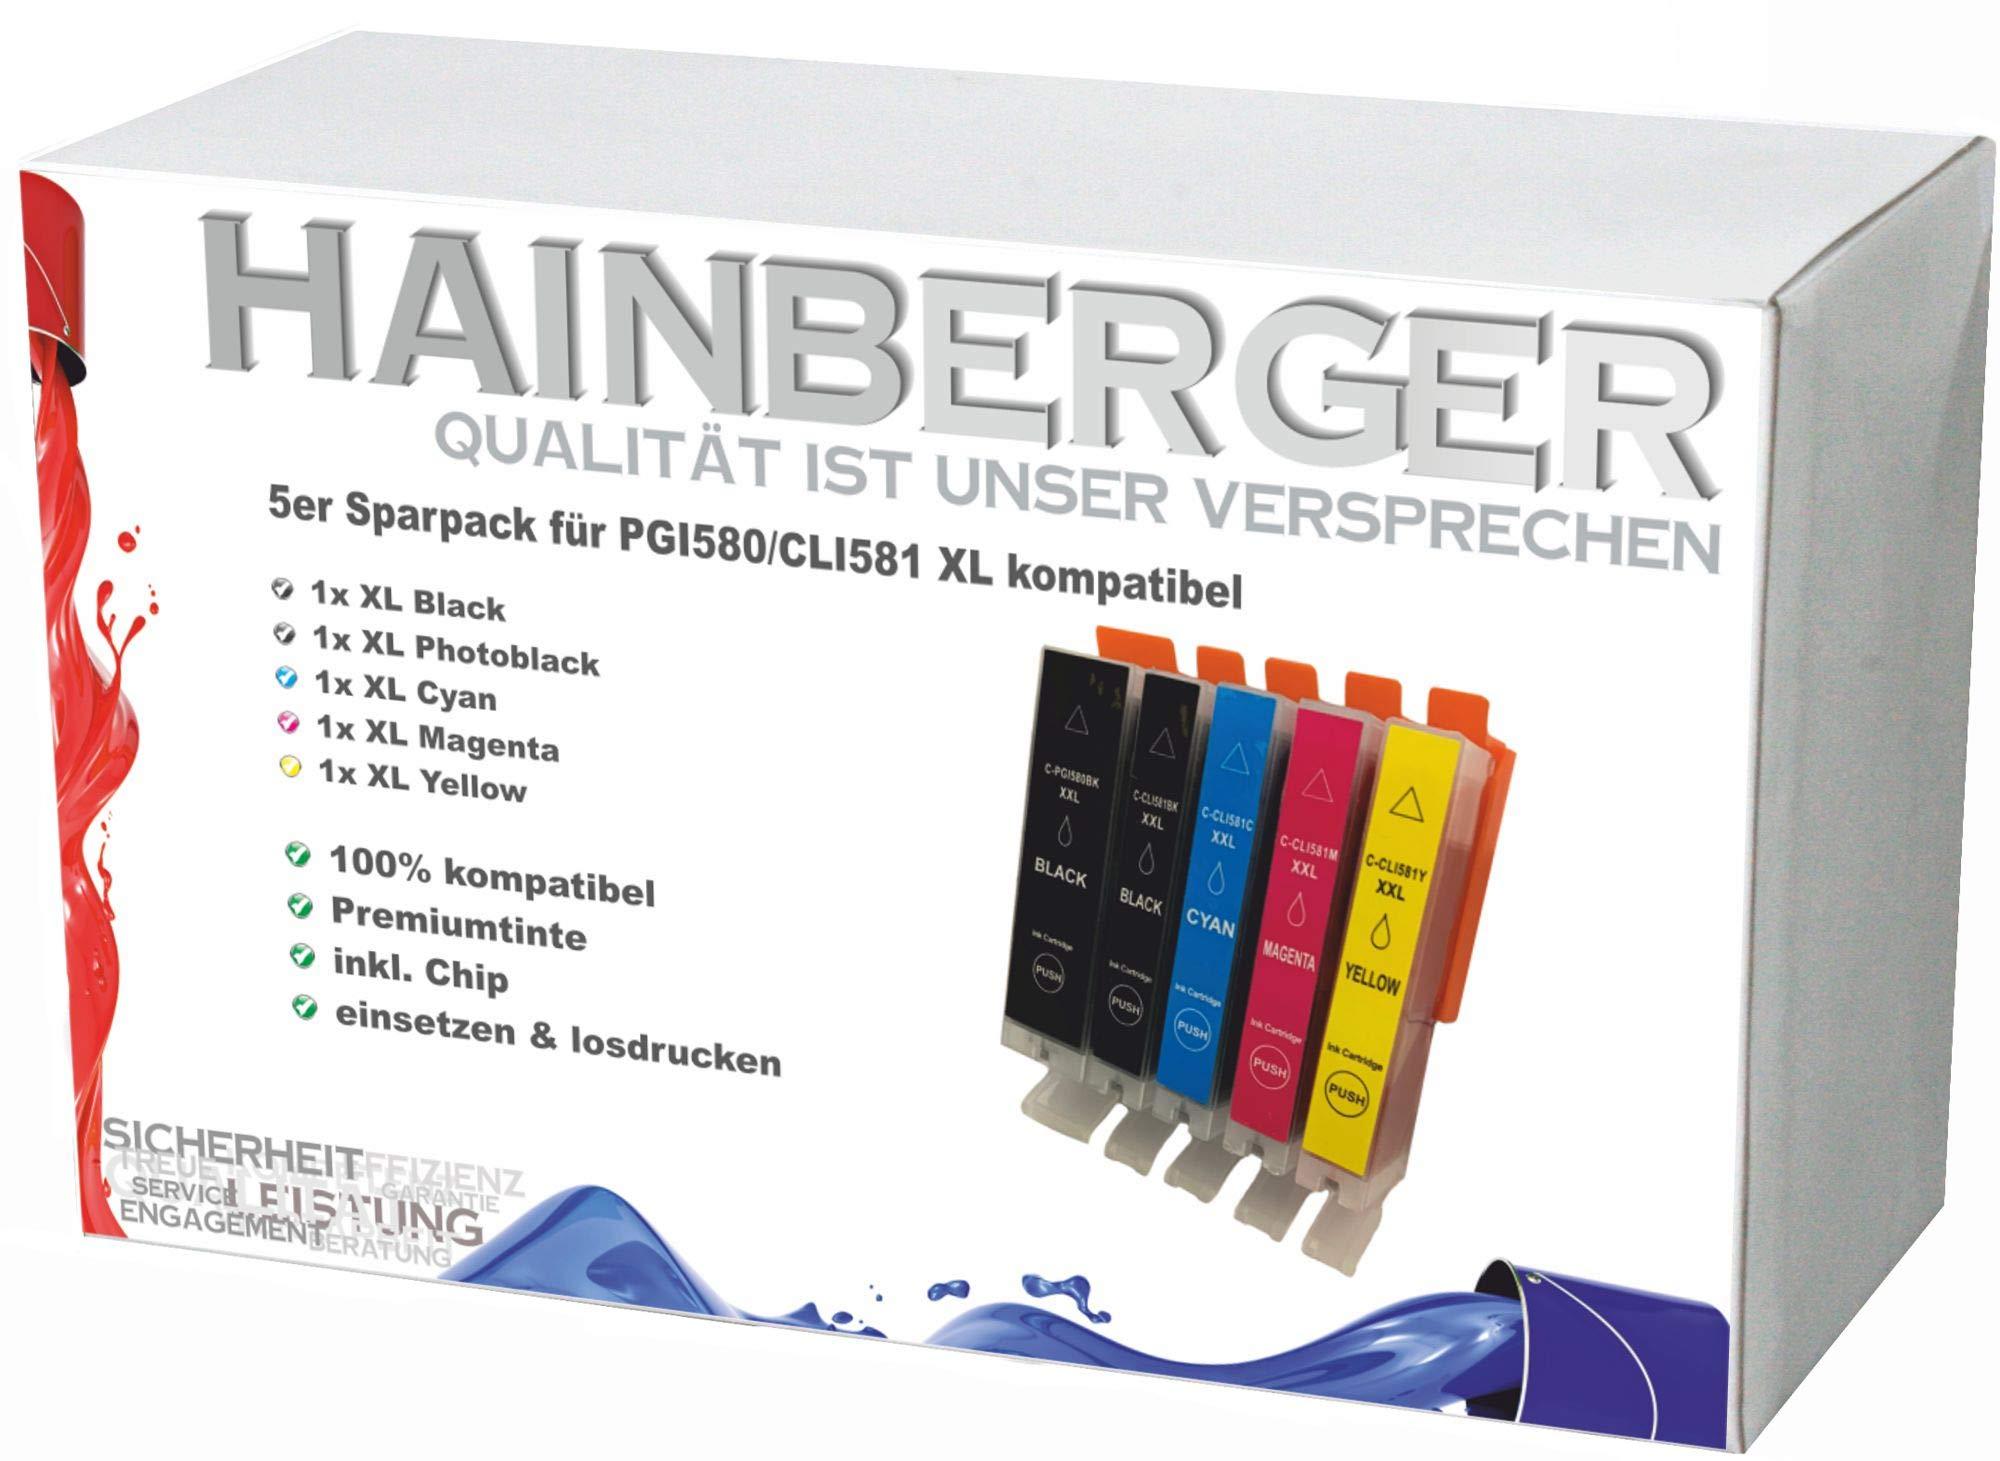 5X-Hainberger-XXL-Patronen-kompatibel-zu-Canon-PGI580-CLI581-Pixma-TR8550-TS6150-TS6151-TS6250-TS8150-TS8151-TS8152-TS8250-TS9150-TS9155-TS9550-TR7550-PGI-580-CLI-581